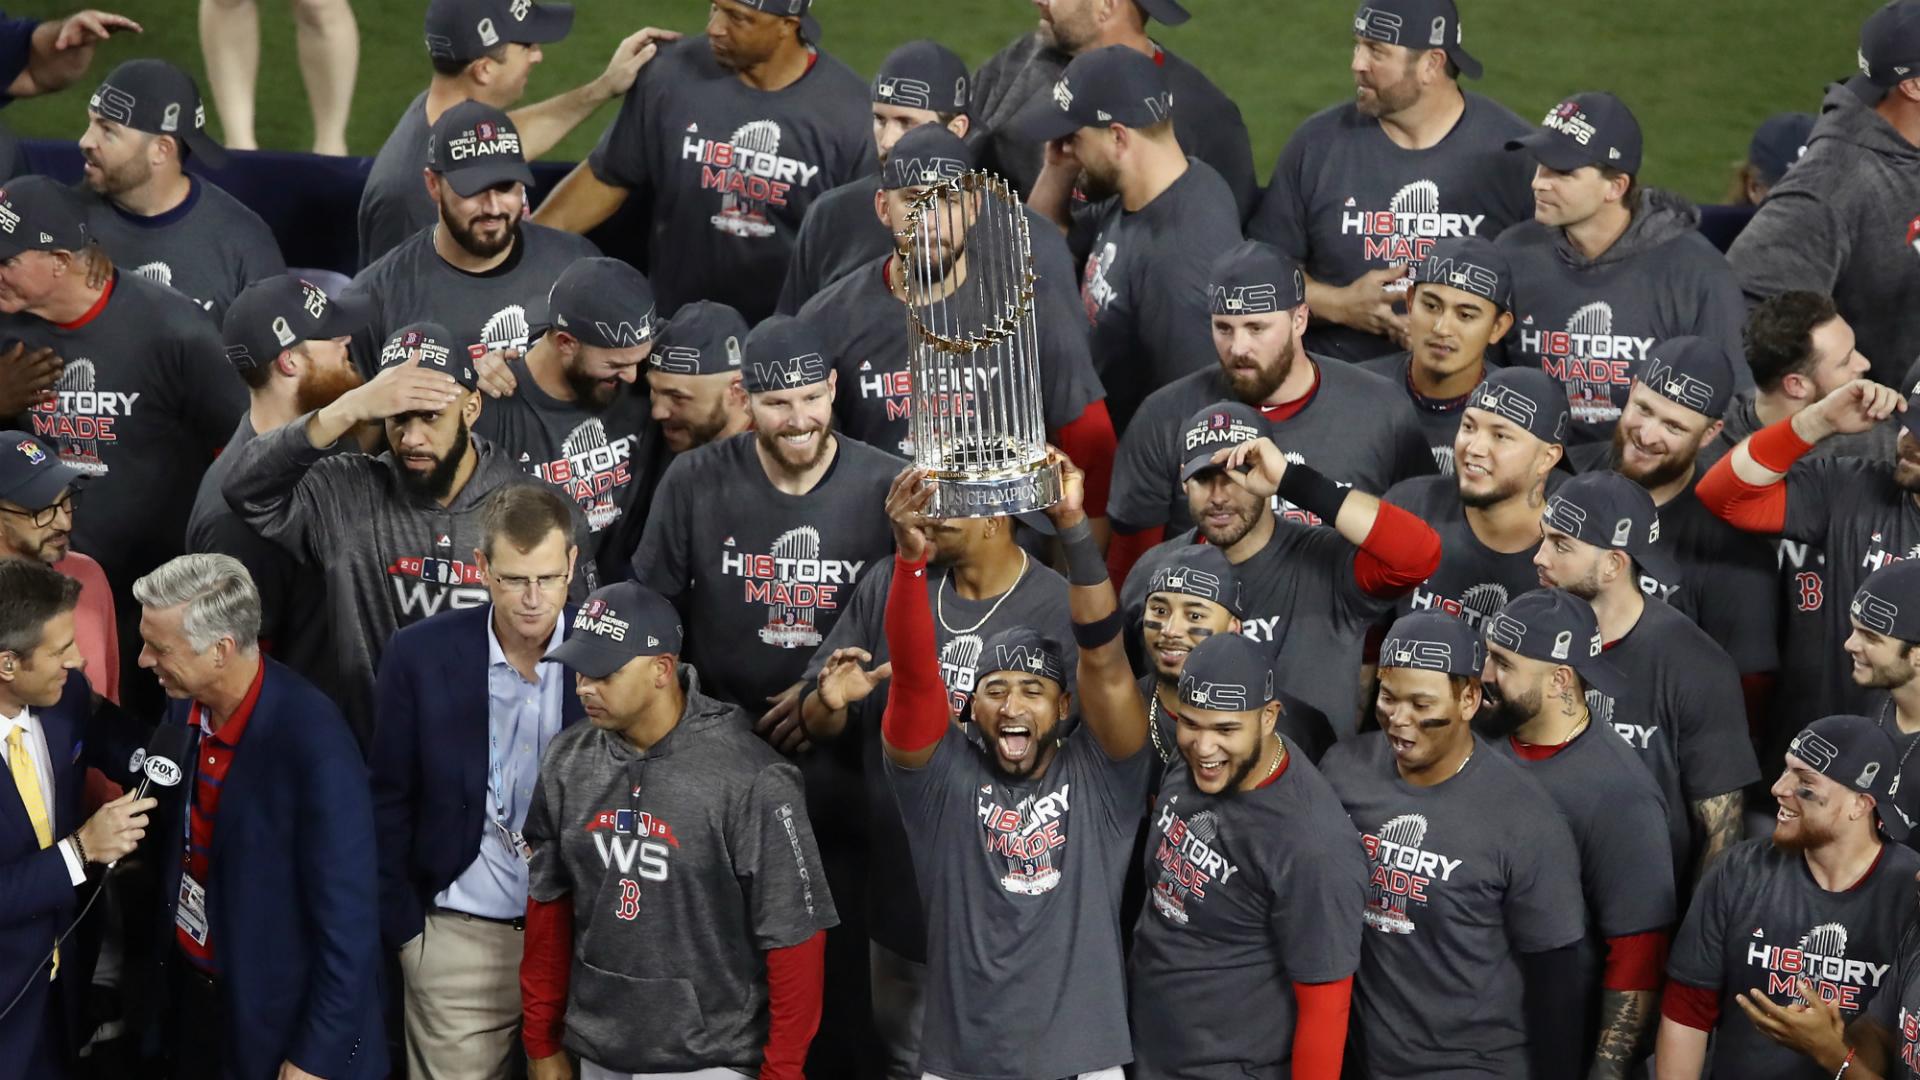 Boston-red-sox-v-los-angeles-dodgers-world-series-mlb-28102018_1h4eewsshmynr1uuo5gr7hjieo